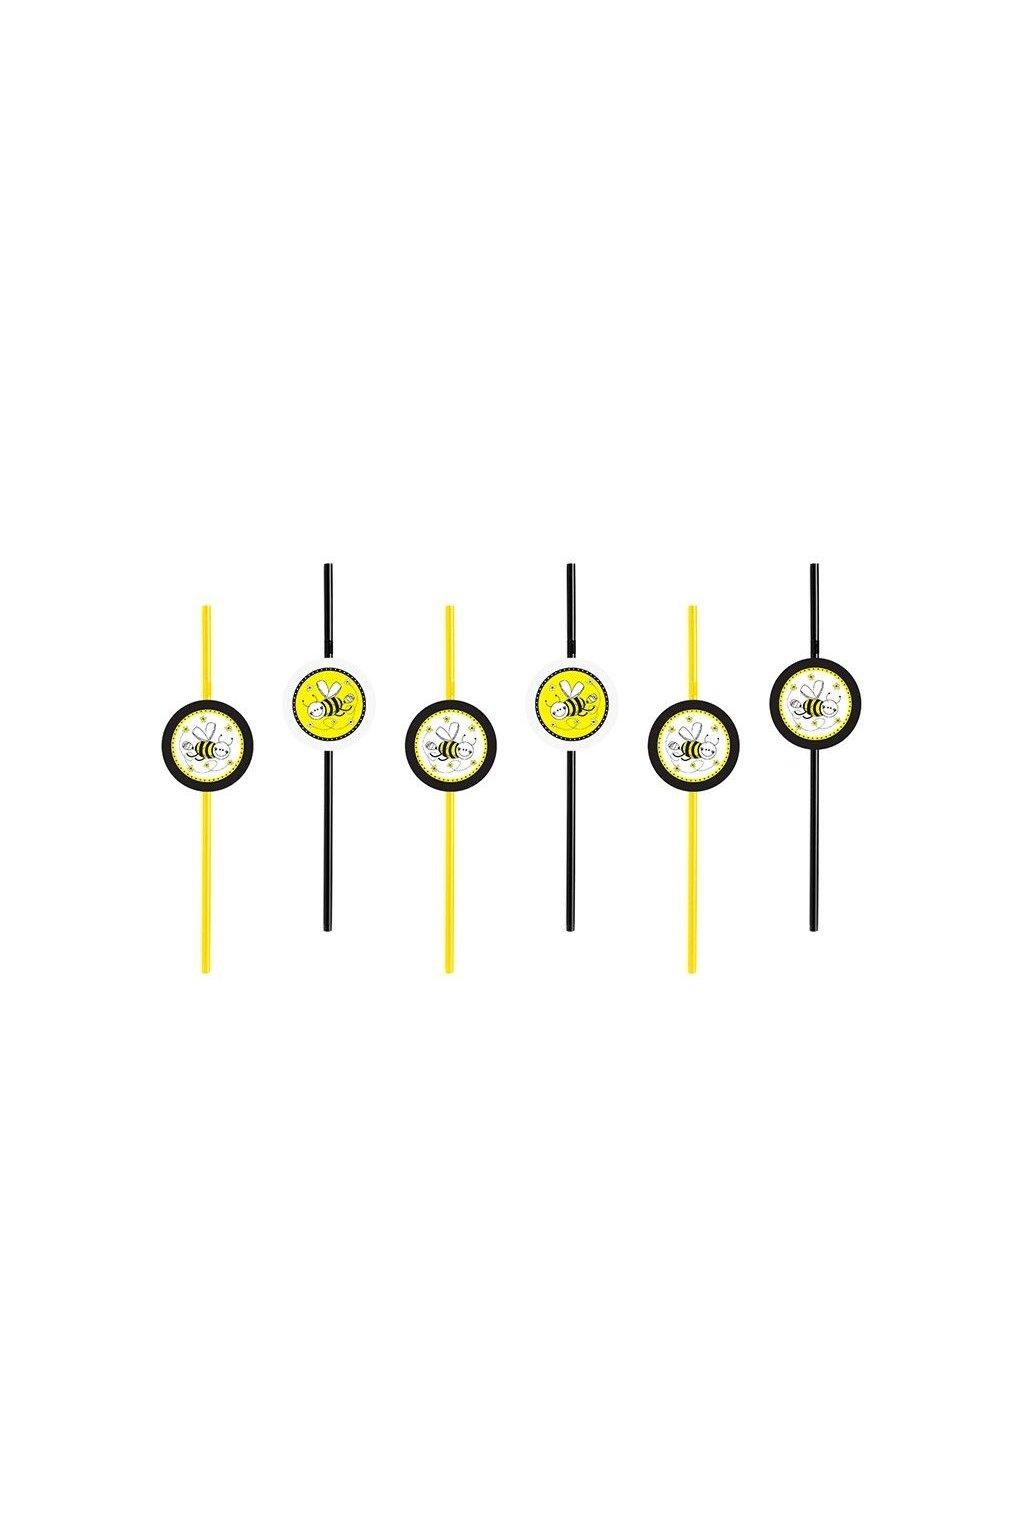 Narozeninová brčka - včelka - 6ks